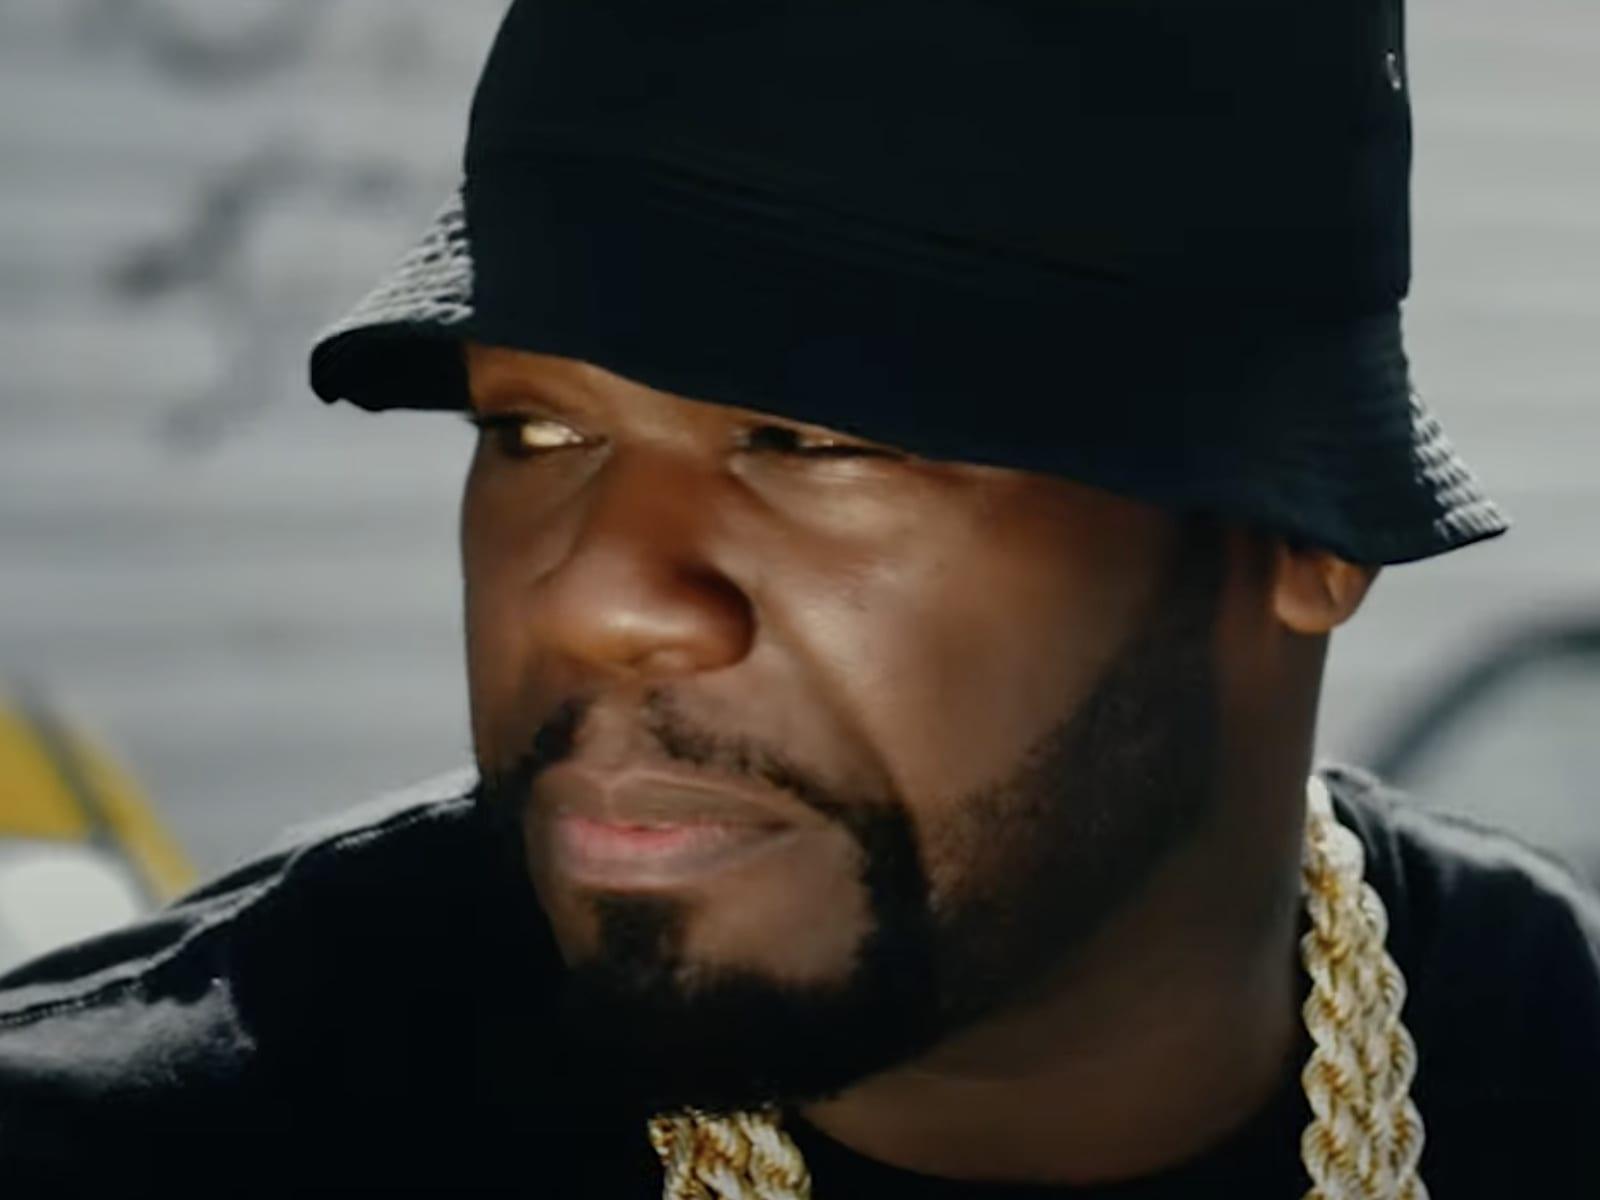 Weekend Recap: 50 Cent Blasts Irv Gotti Over DMX Claims  SOHH.com